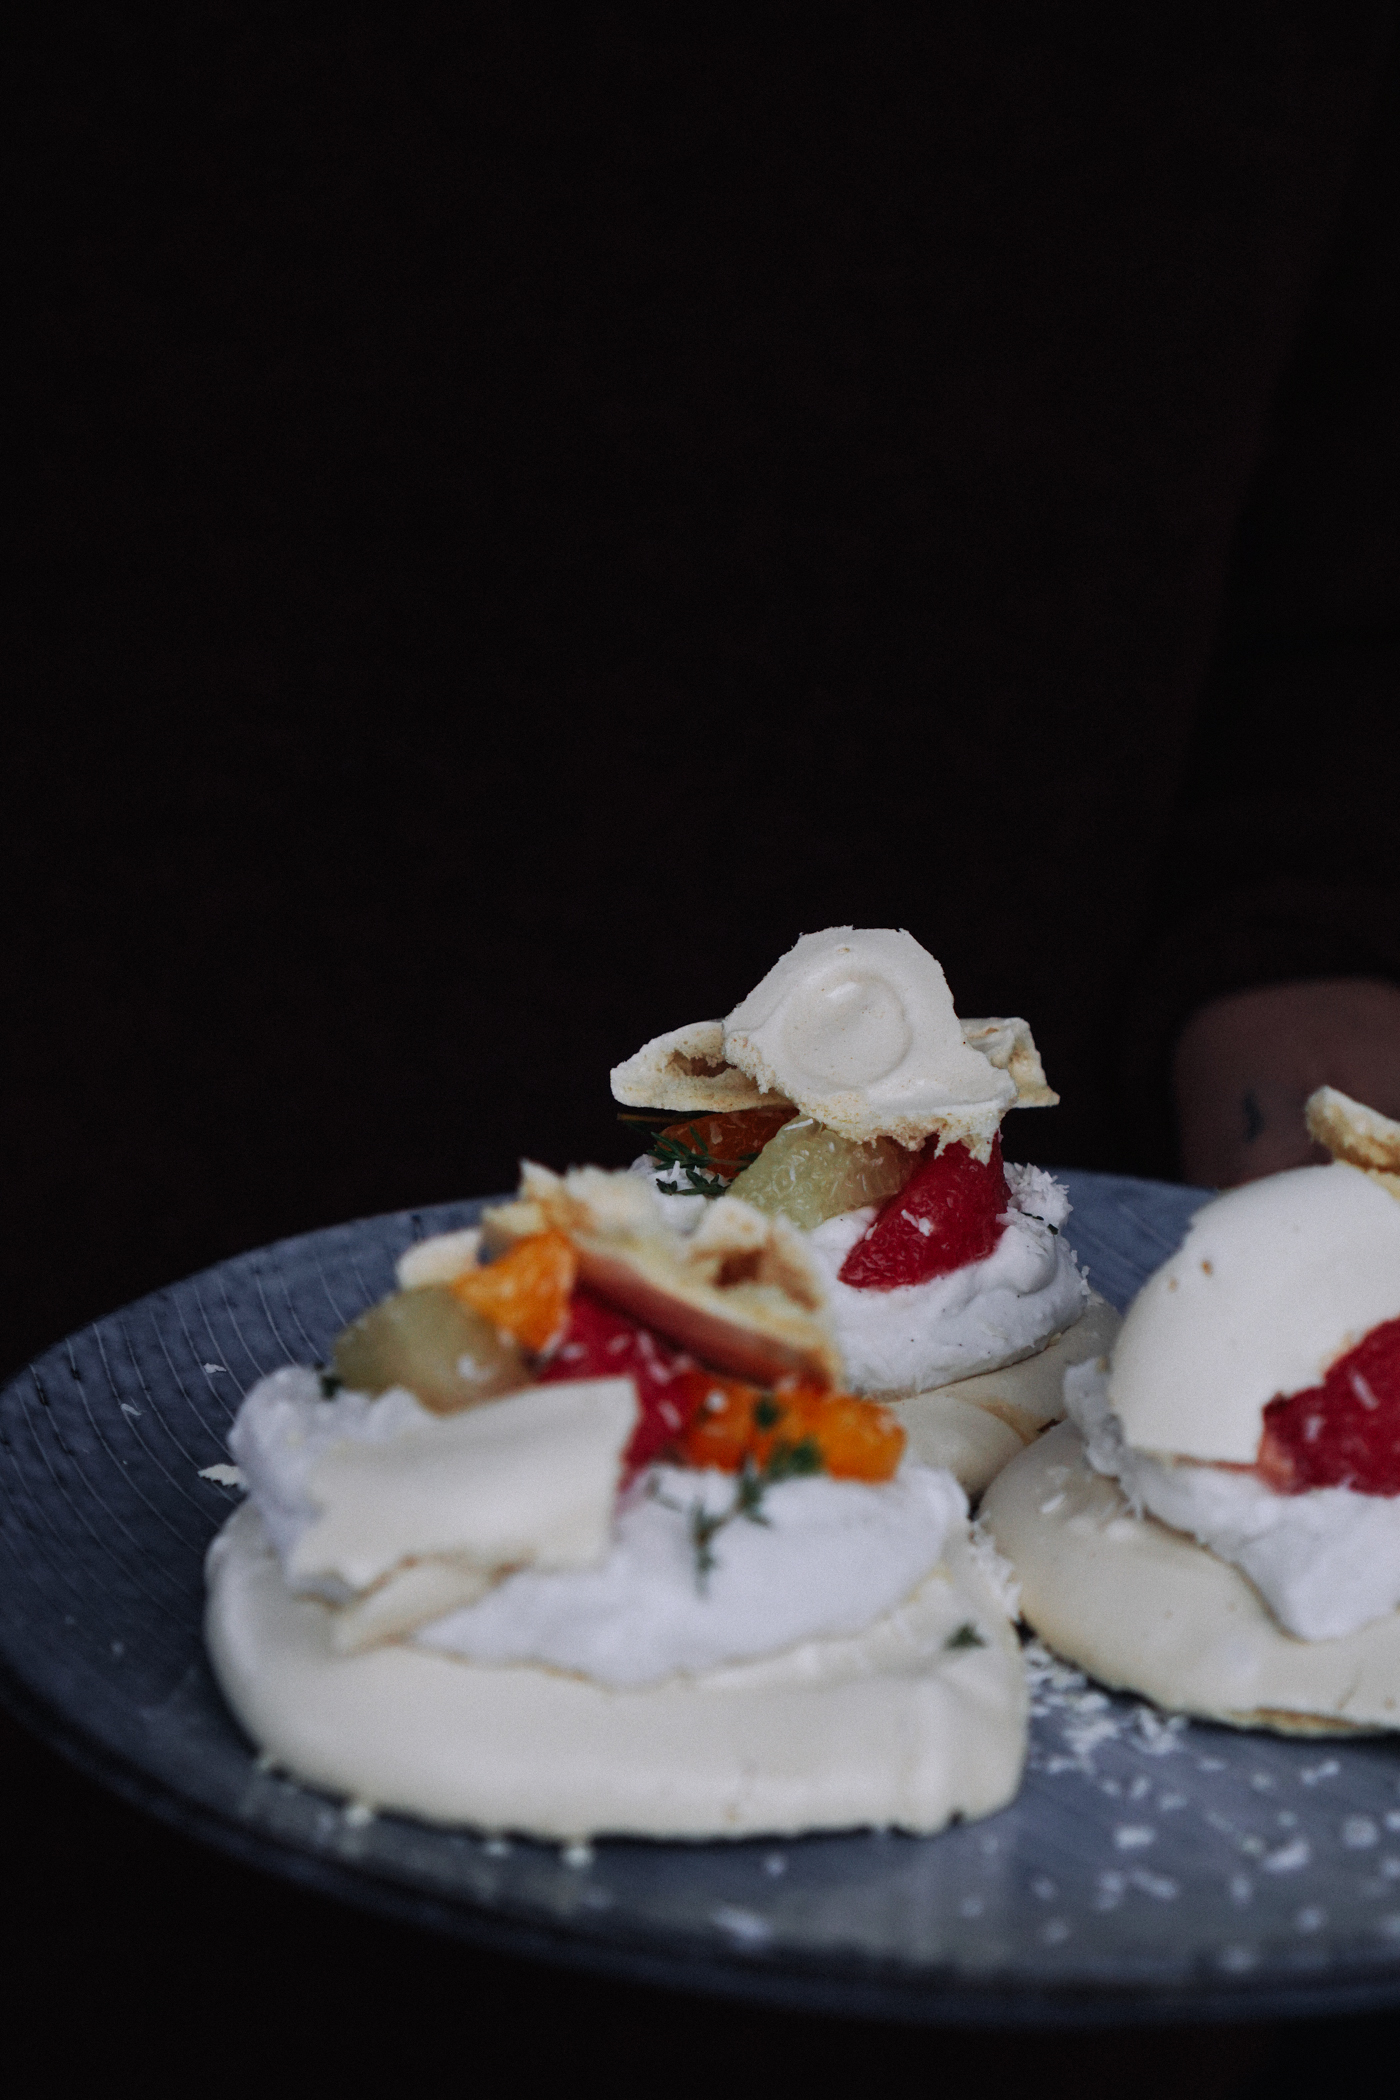 vegan_citrus_pavlova_with_coconut_cream_and_thyme-50.jpg